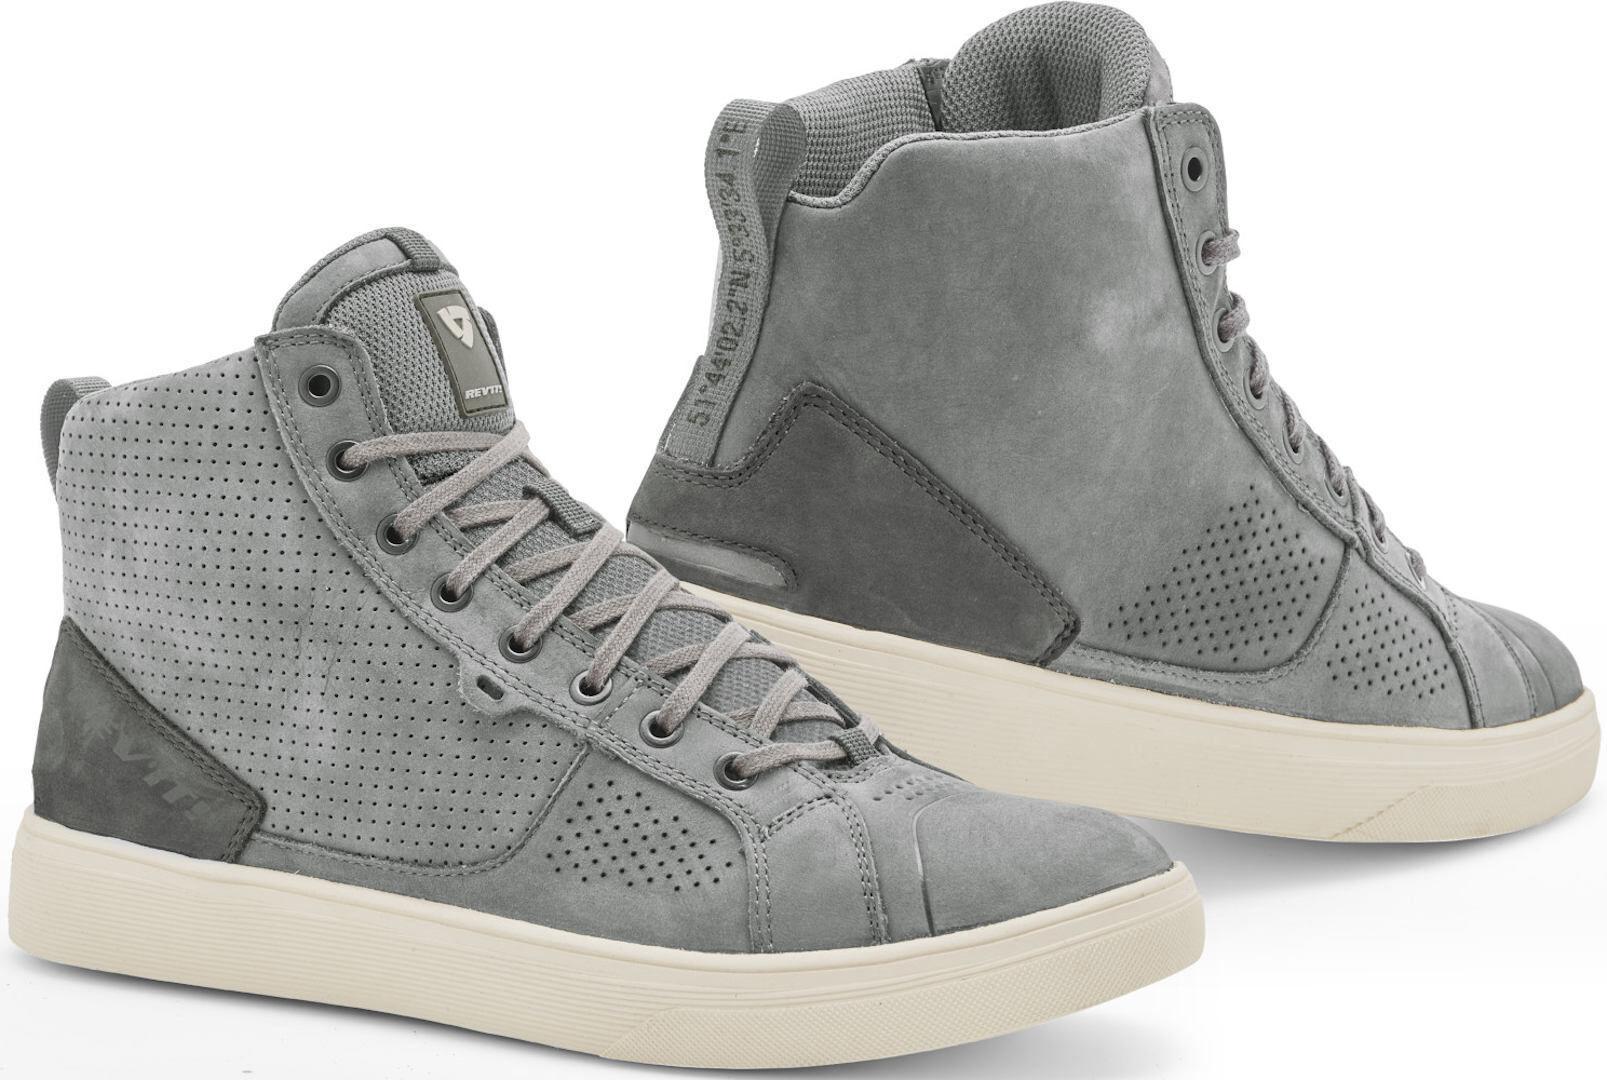 Revit Arrow Motorcycle Shoes Grey 44